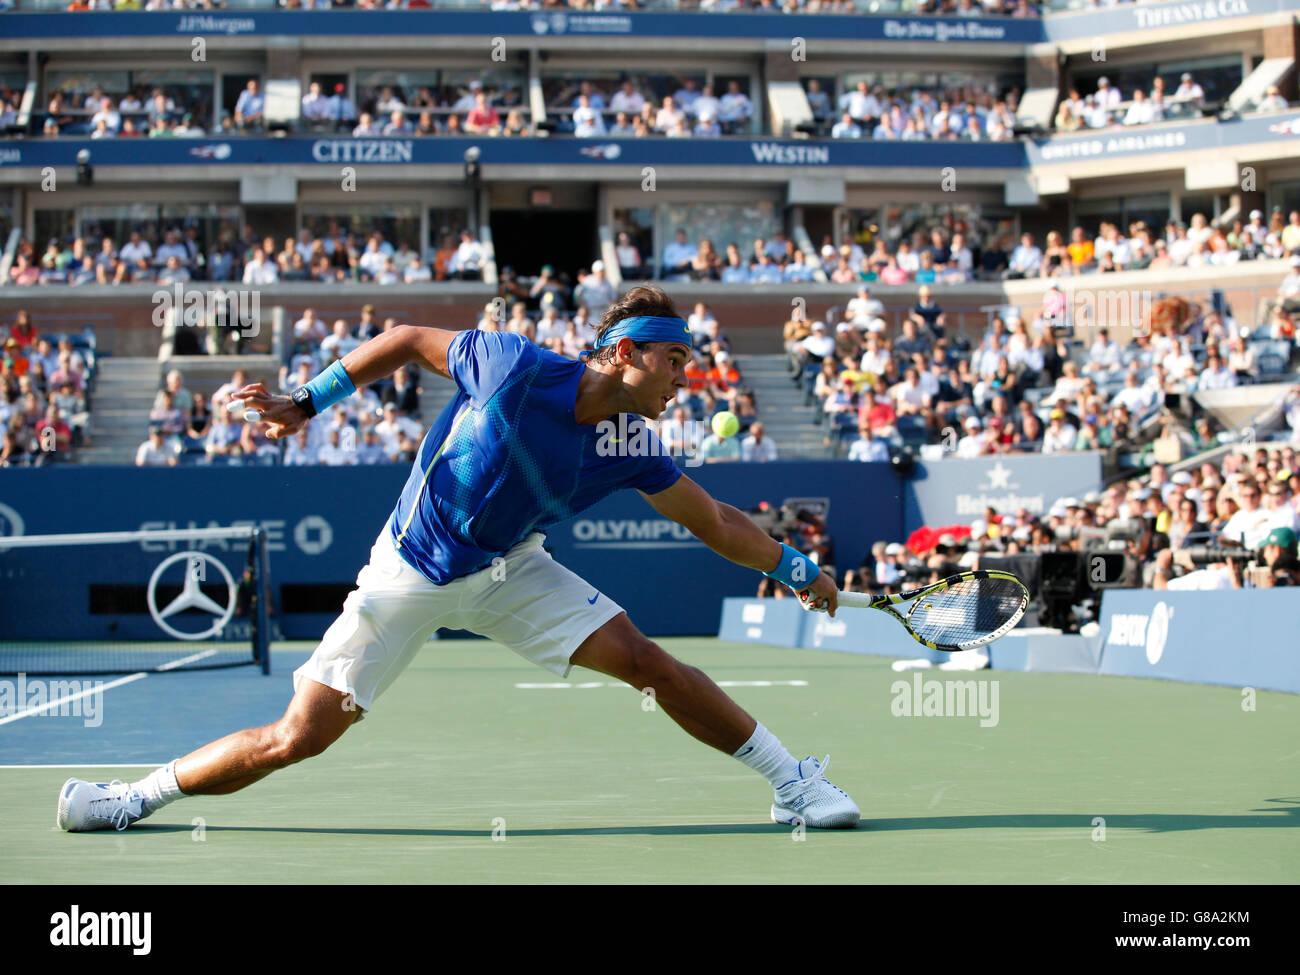 Men's final, Rafael Nadal, ESP, ITF Grand Slam tennis tournament, U.S. Open 2011, USTA Billie Jean King National - Stock Image